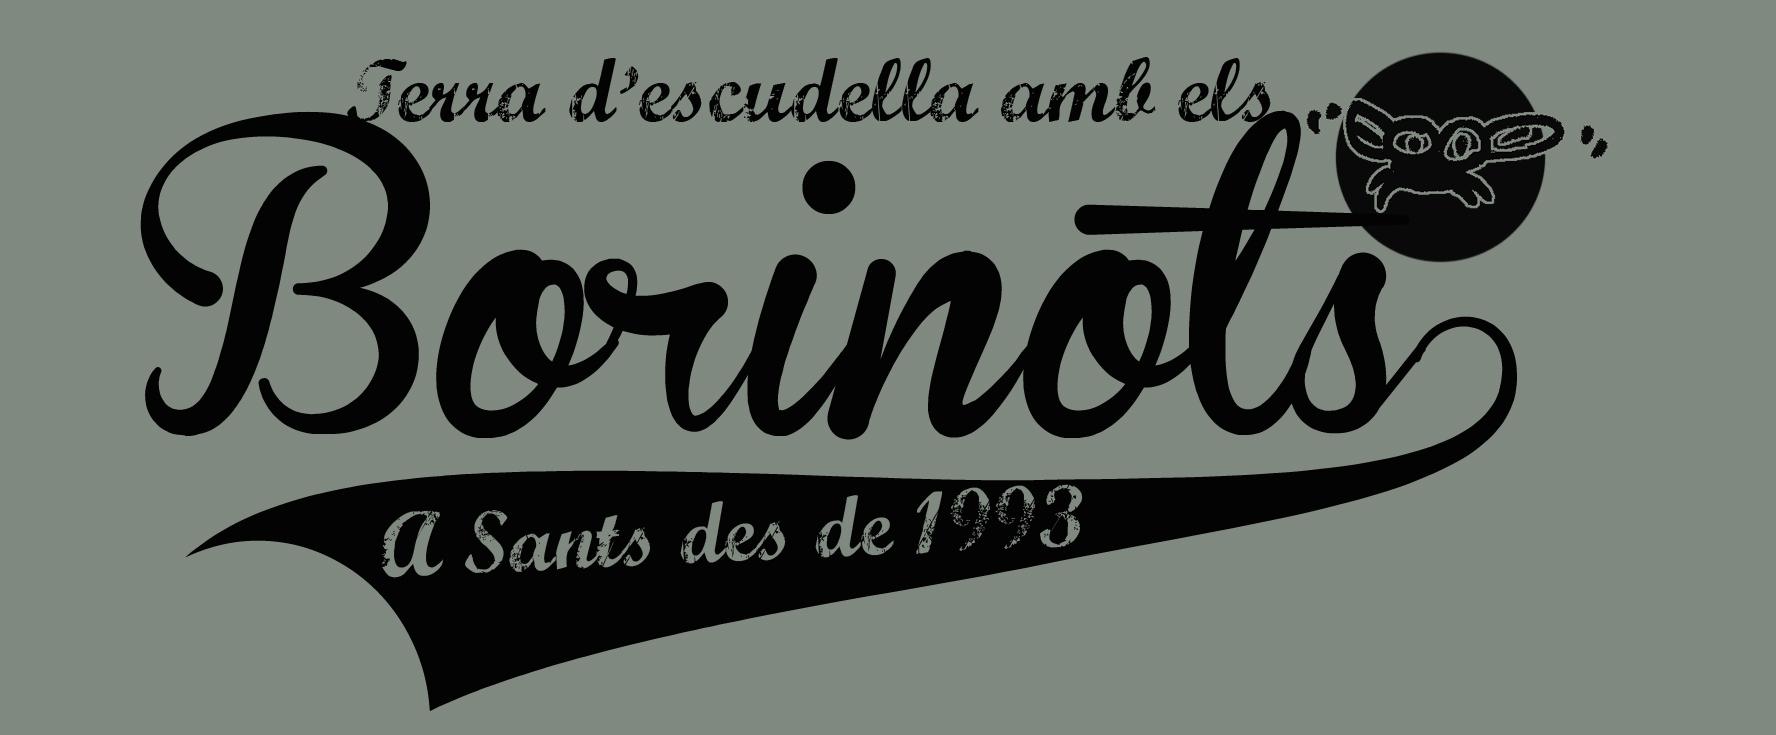 logo-samarreta-FM-2013